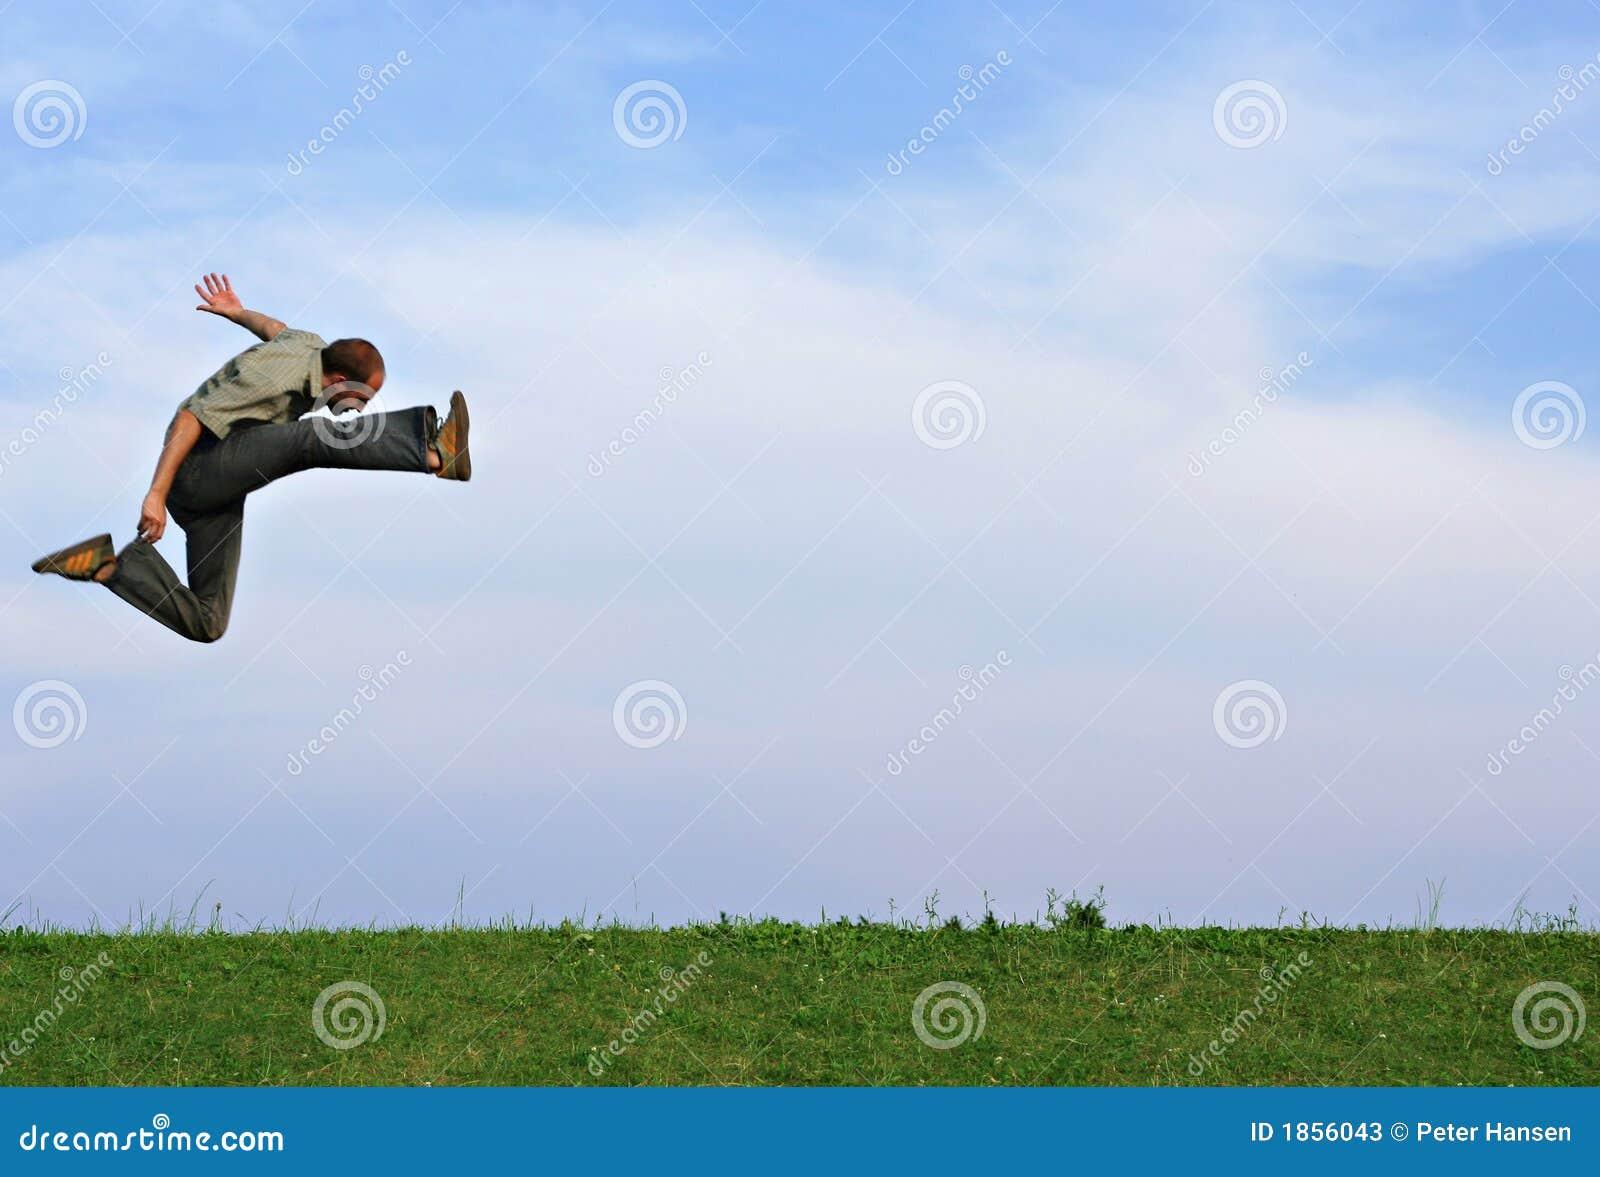 athletic jump stock photos image 1856043